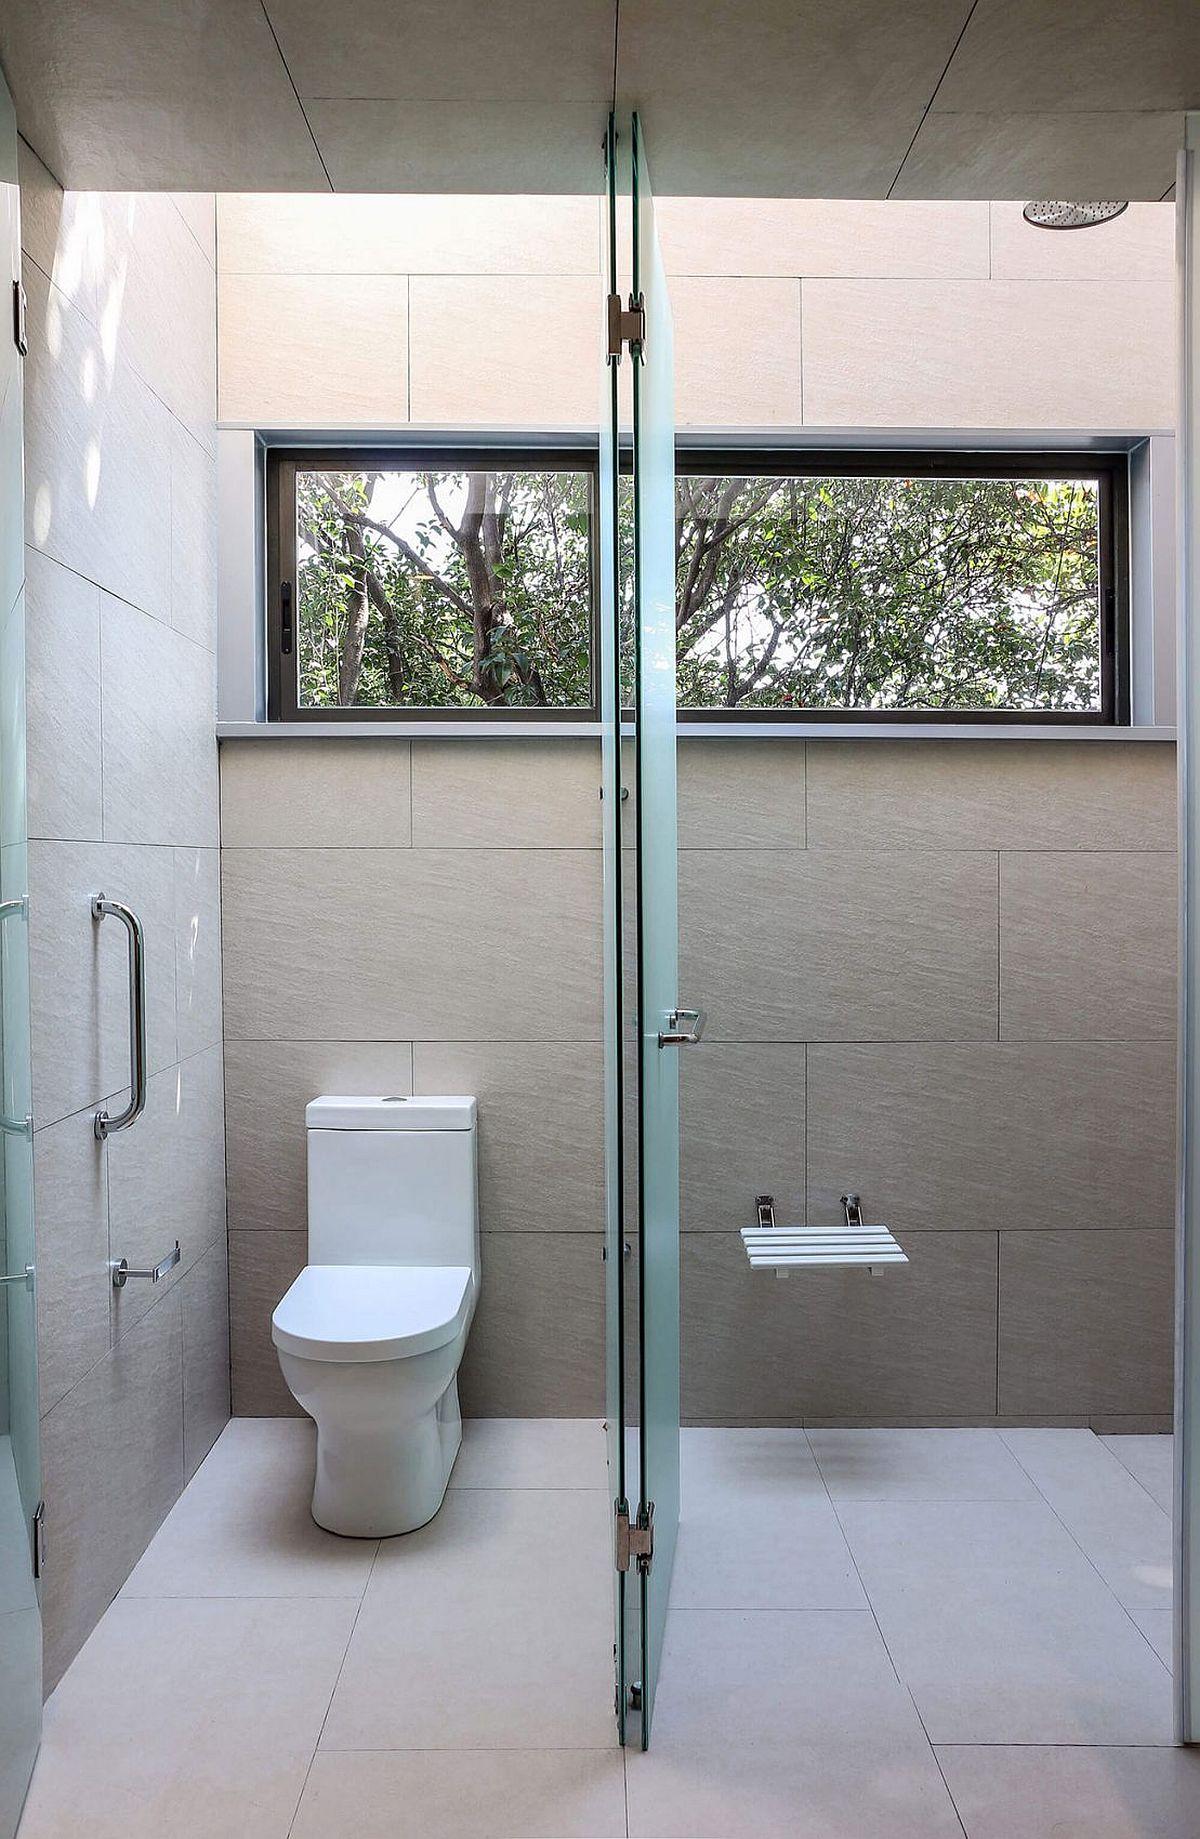 Skylight brings natural light into the modern bathroom